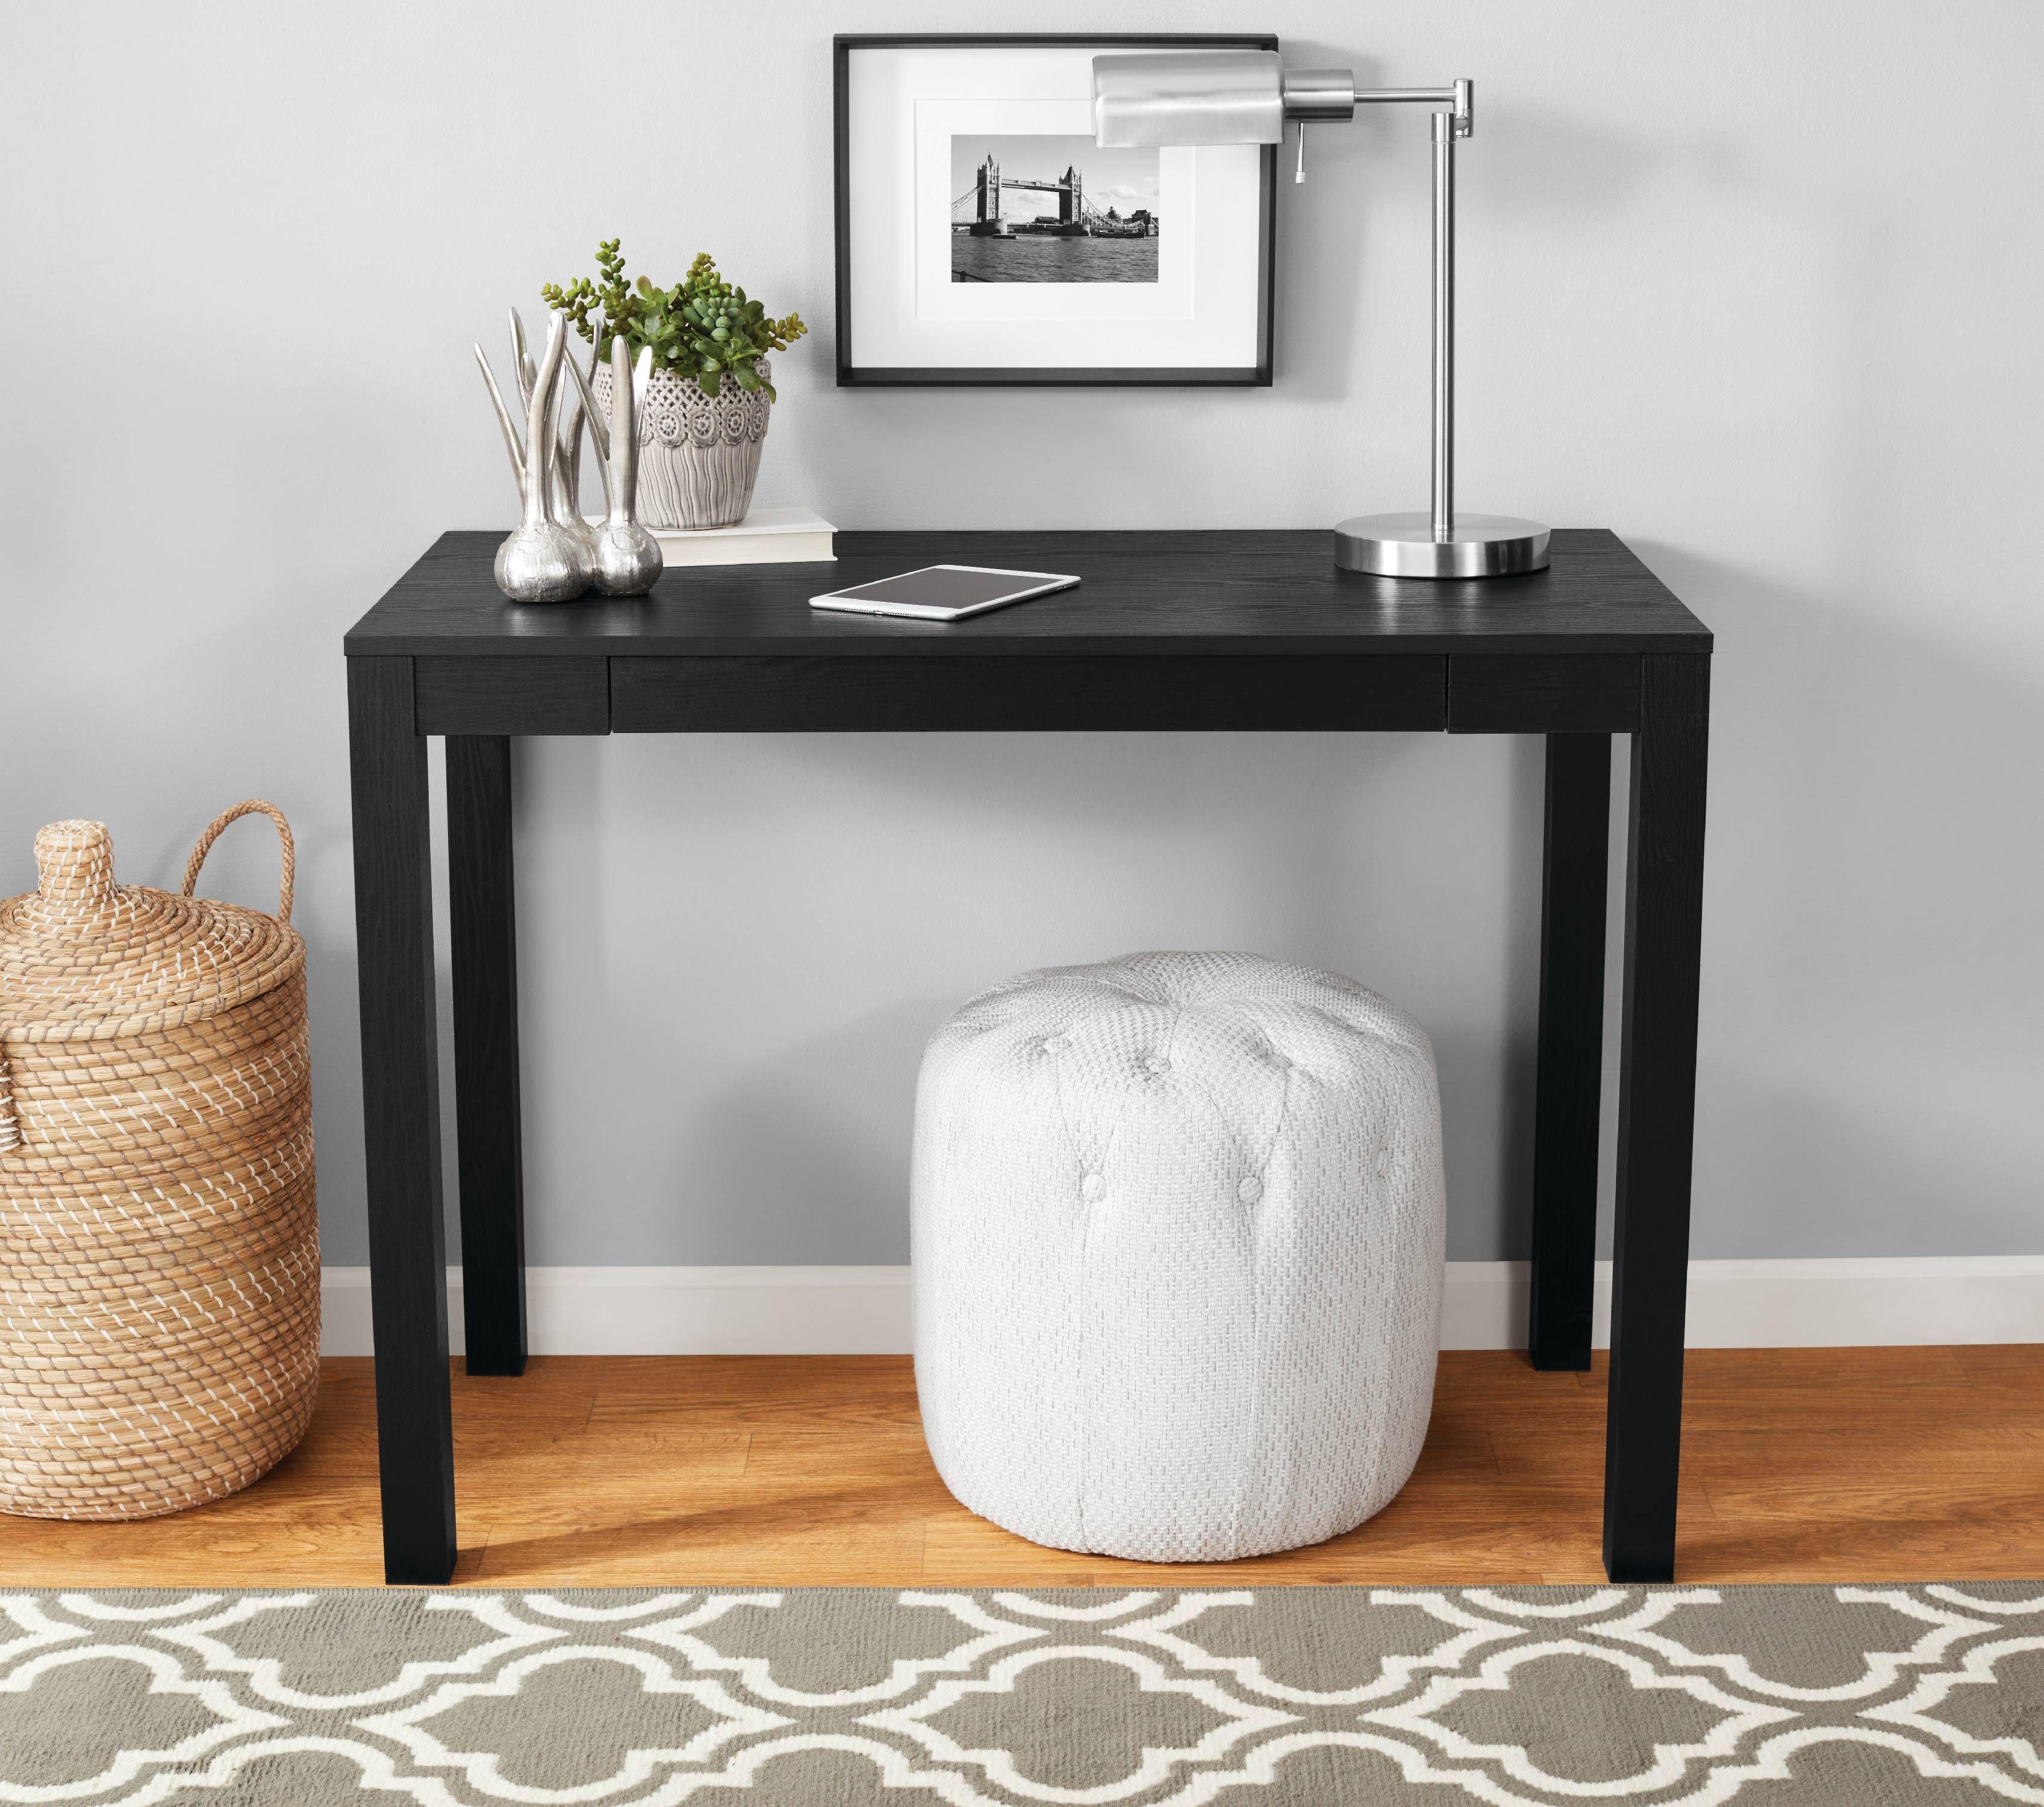 Mainstays Parsons Desk With Drawer Black Oak Walmart Com In 2020 Desk With Drawers Desk Storage Parsons Desk